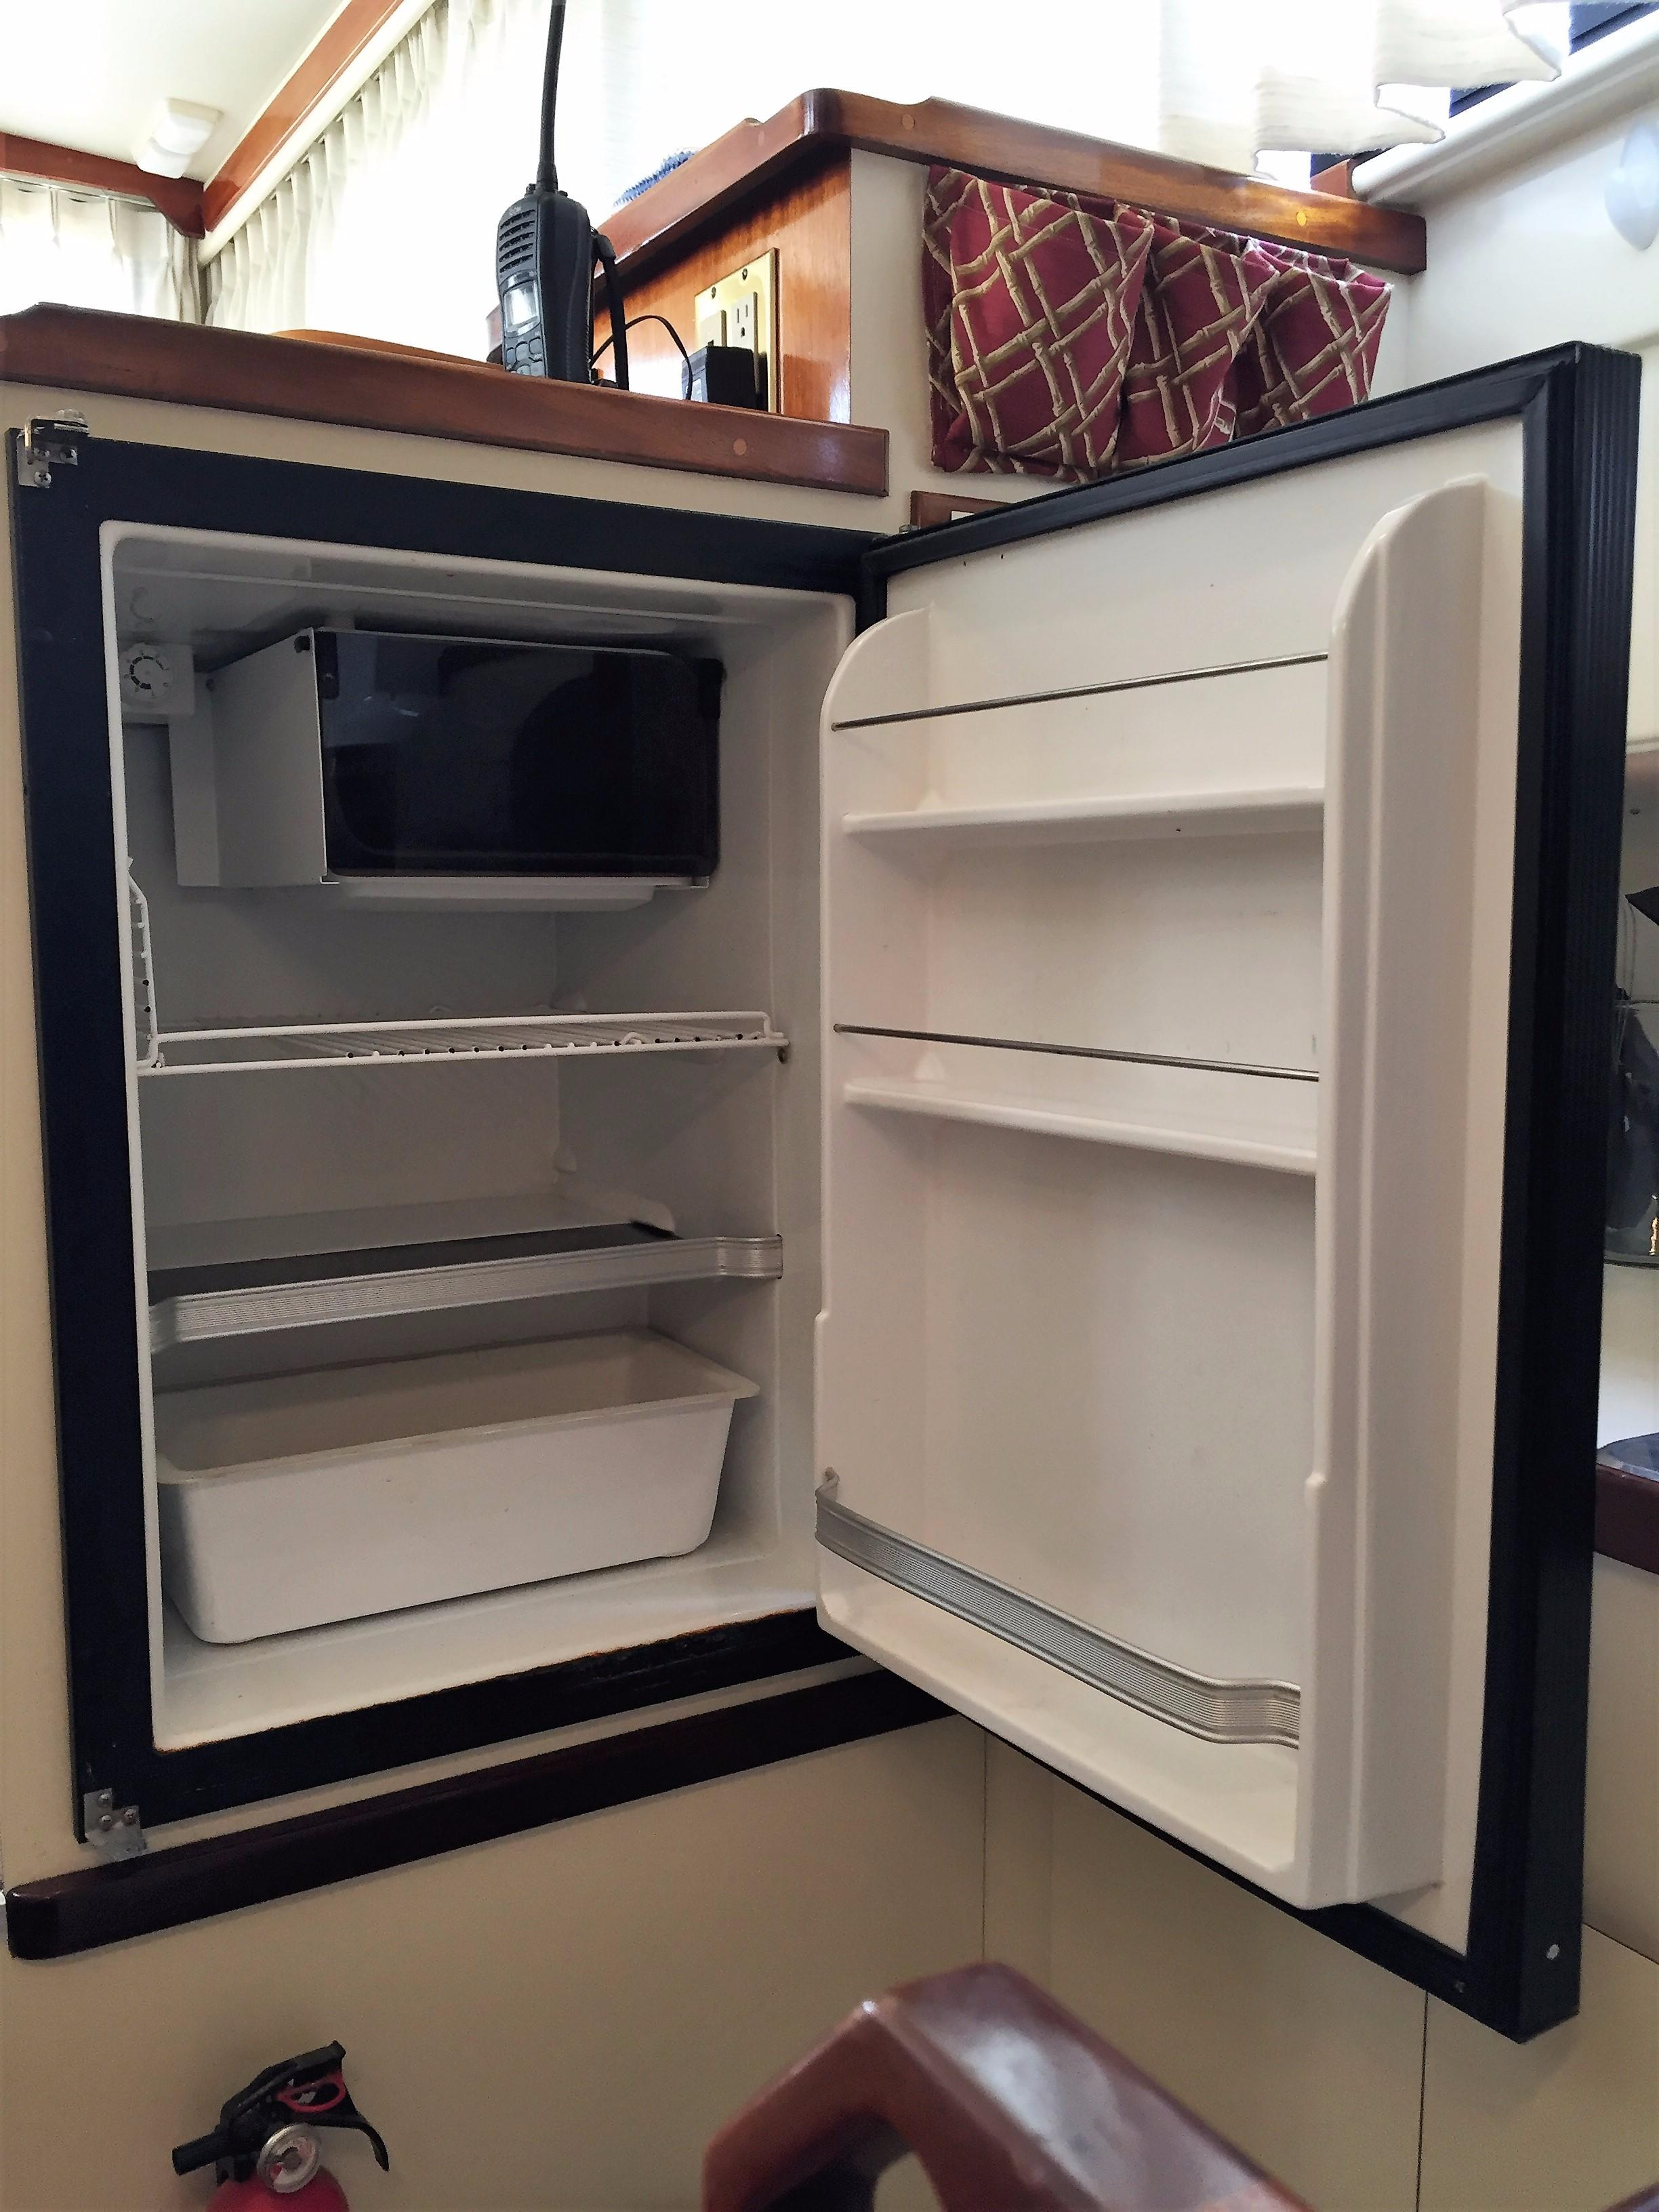 Camano Troll - refrigerator